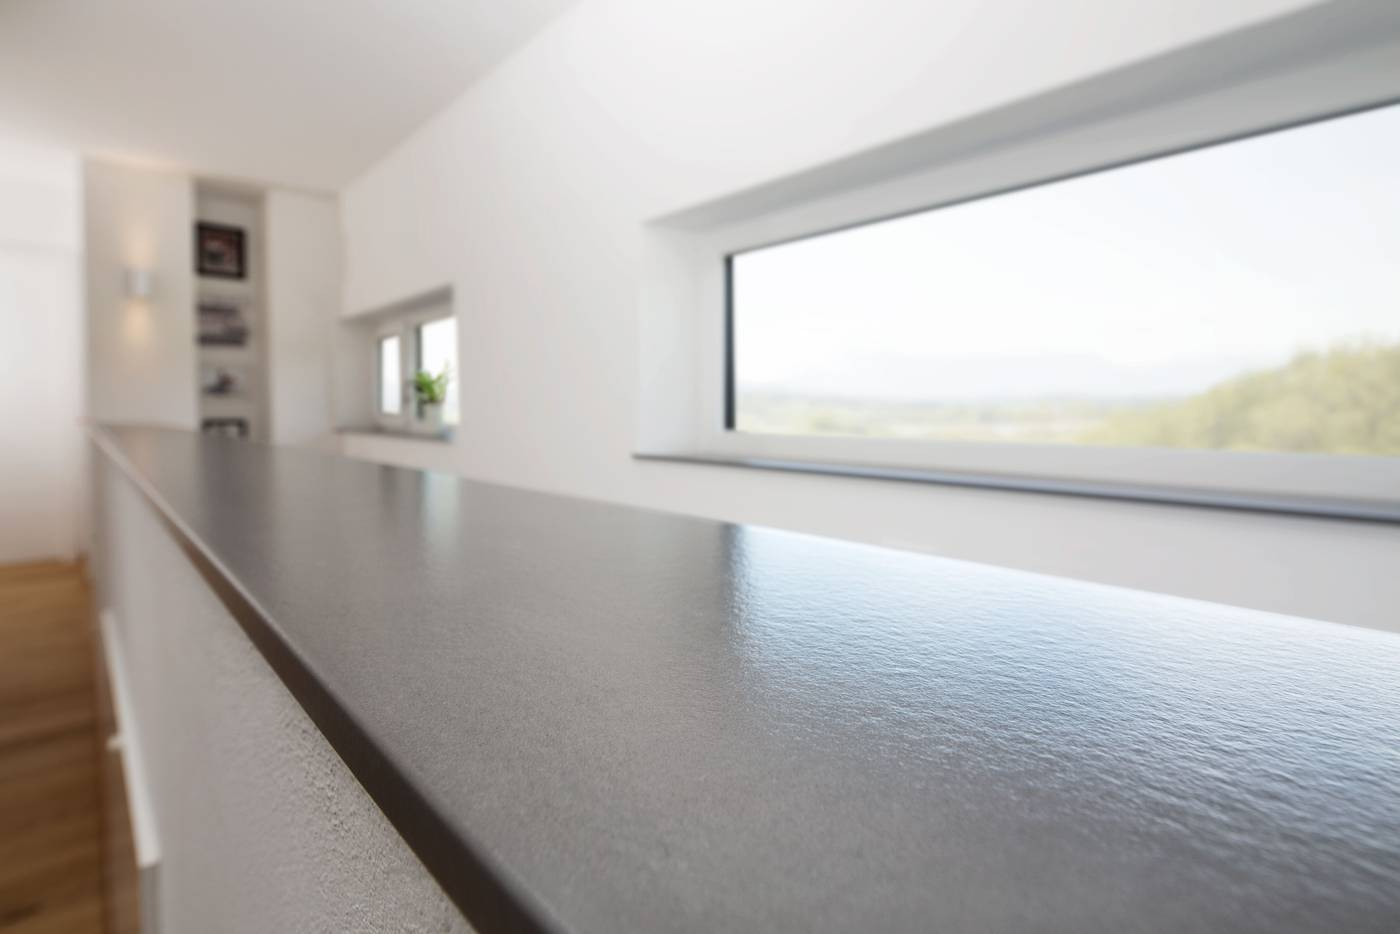 mauerabdeckungen helopal hirth. Black Bedroom Furniture Sets. Home Design Ideas